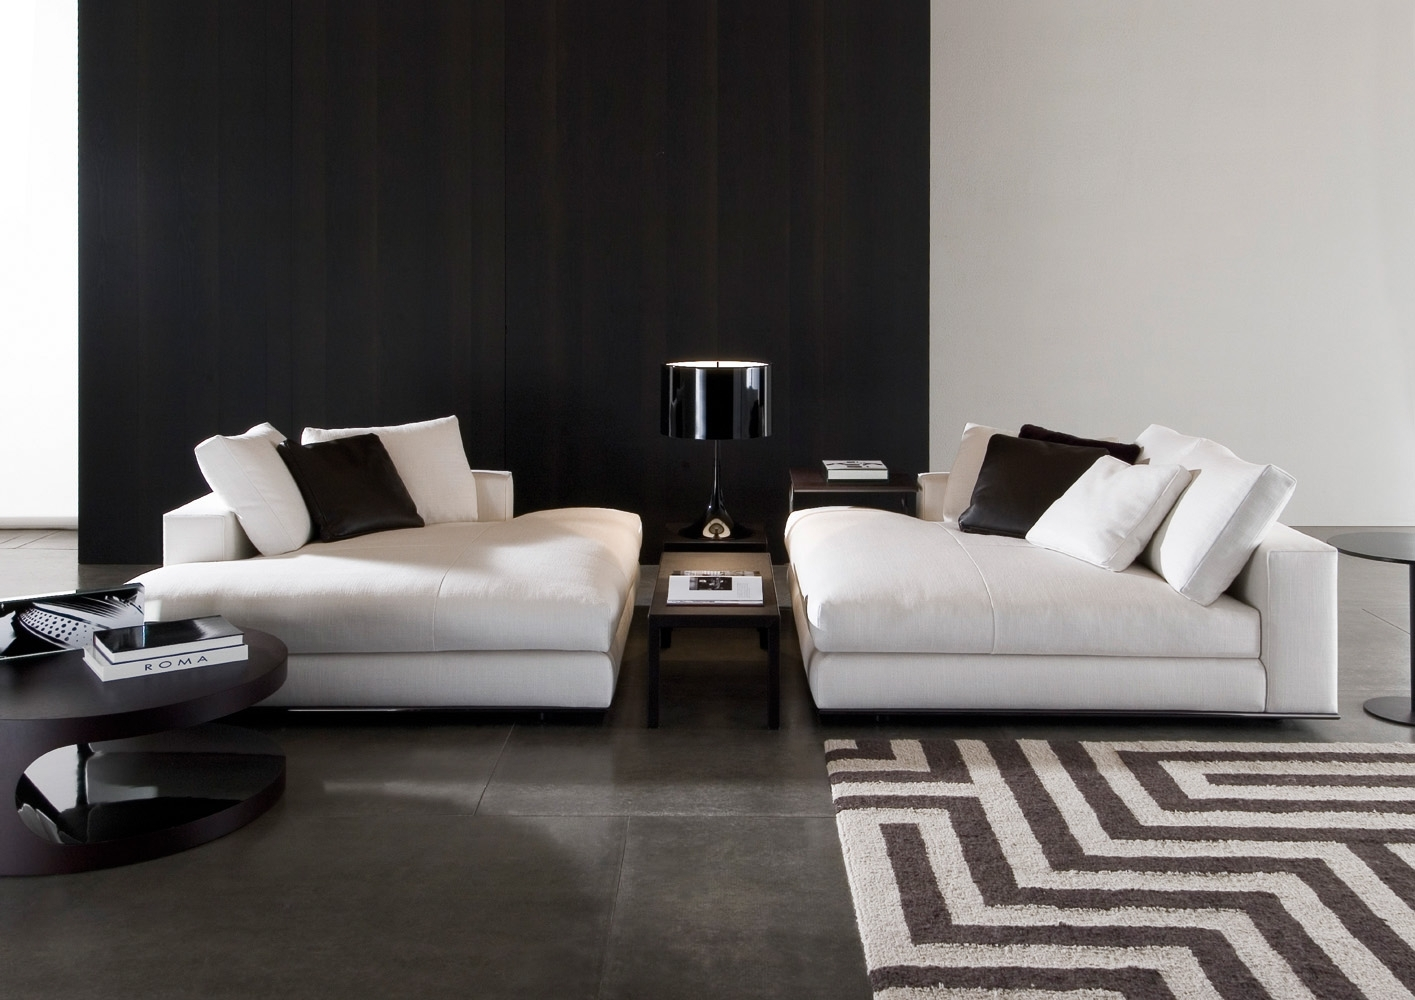 sofas hamilton ontario sofa settee difference 10 best ideas sectional